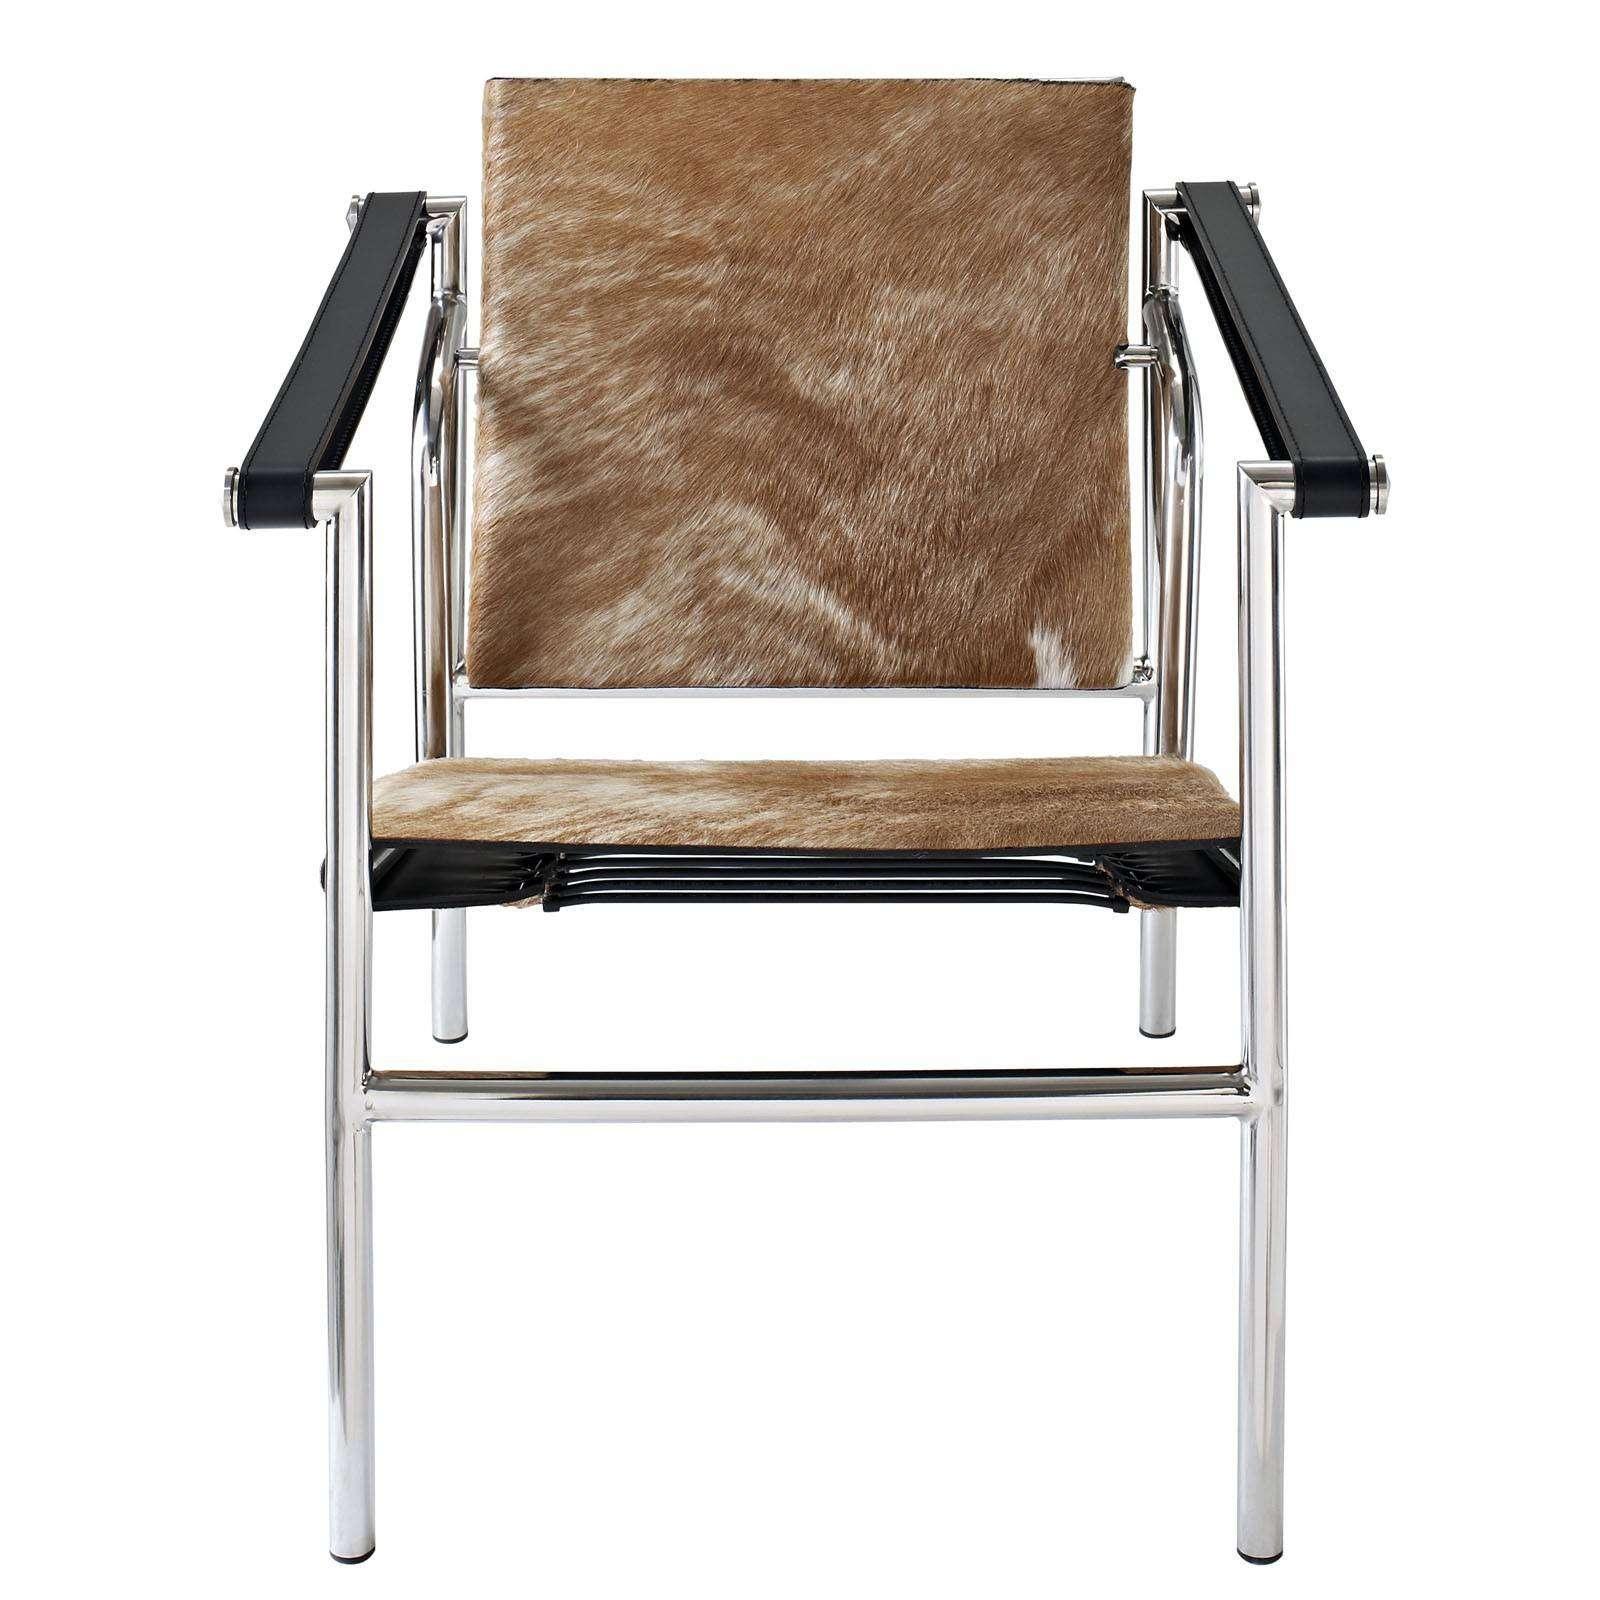 Le corbusier style lc1 sling chair cowhide - Chaise lc1 le corbusier ...